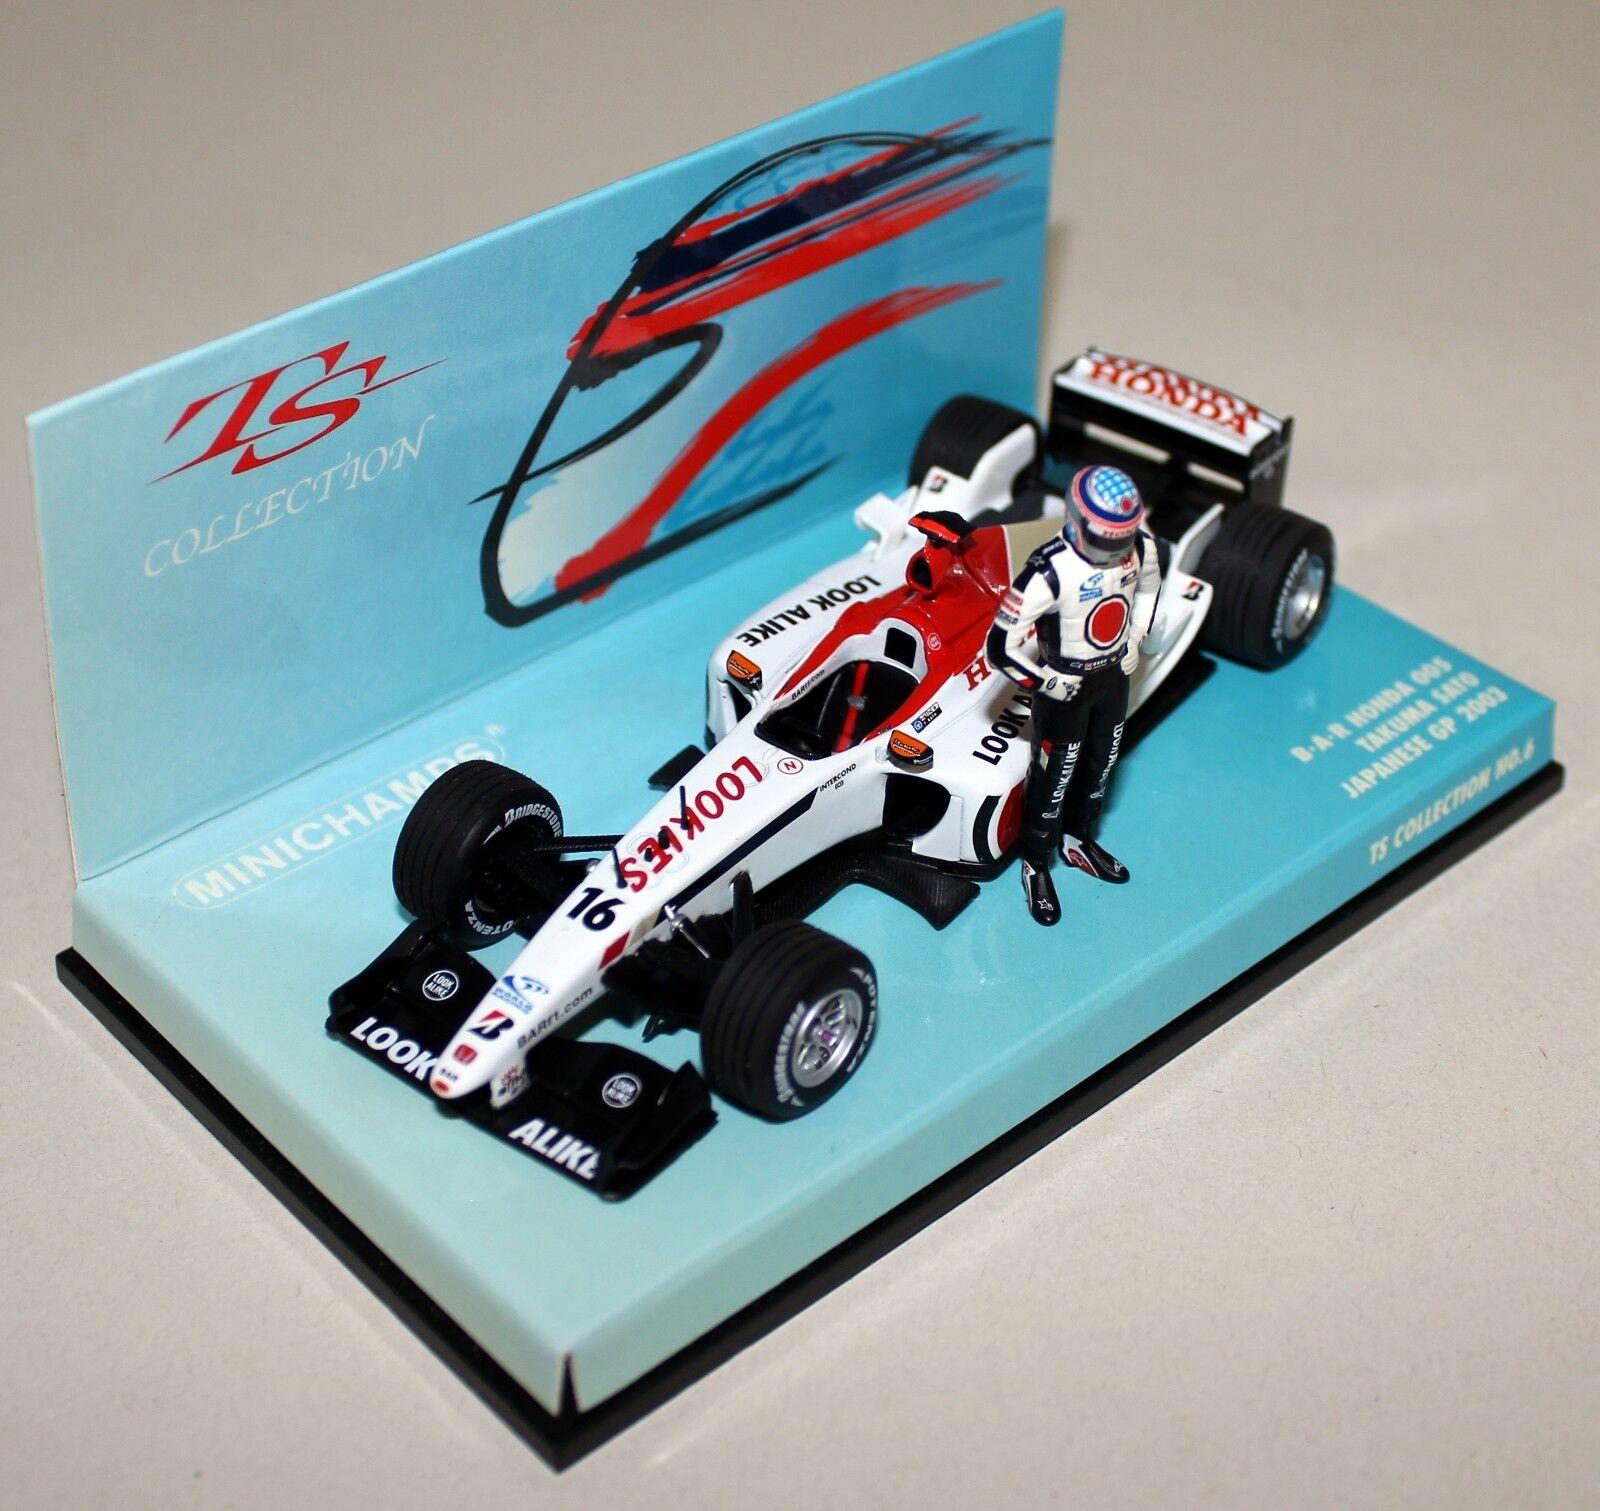 Minichamps 1 43 Scale 518 034316 B.A.R Honda 005 T Sato + Figure Diecast F1 Car